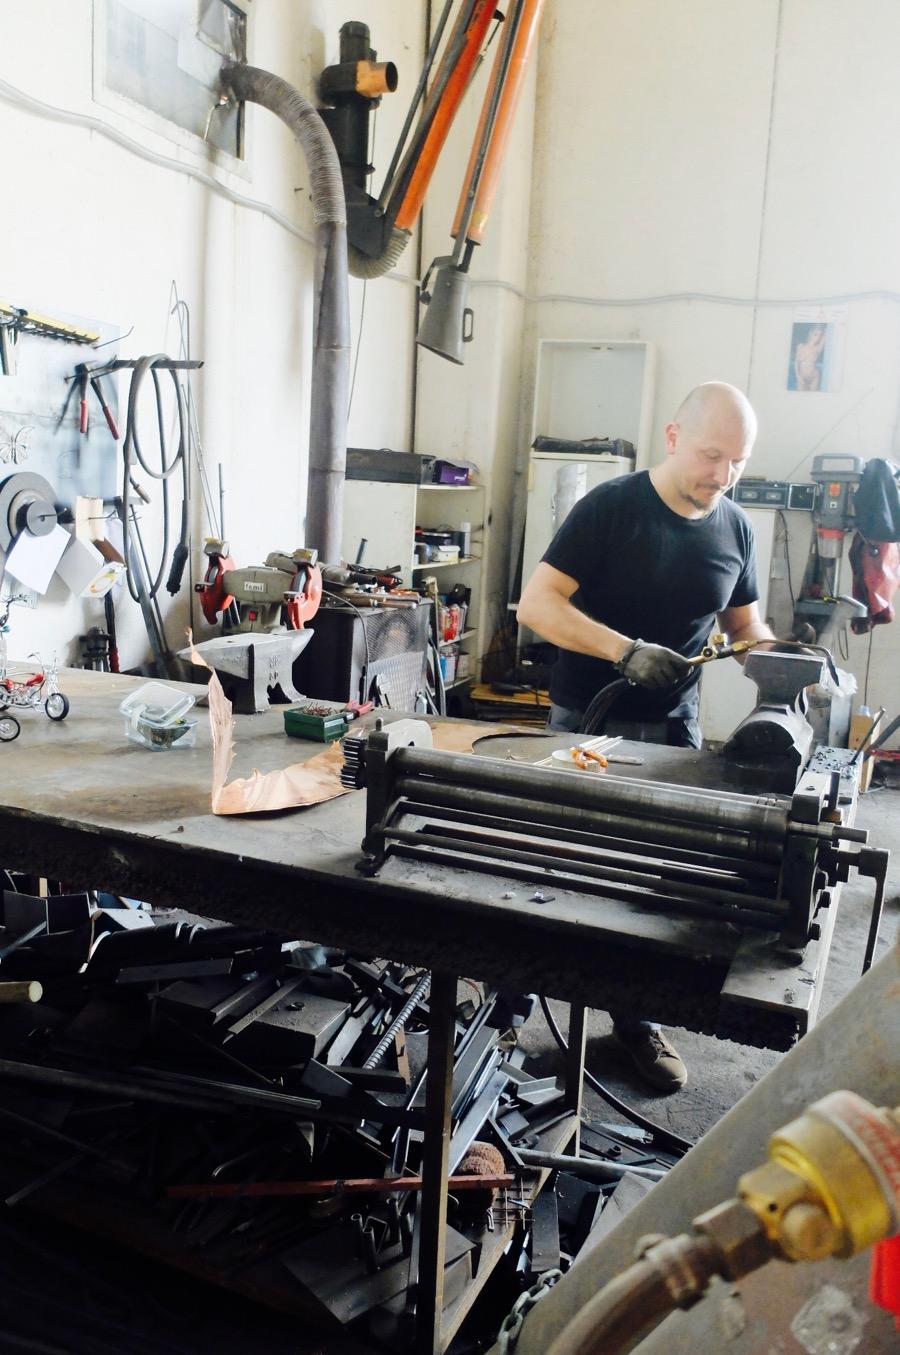 Fabrizio Maffei showing us how melding is done